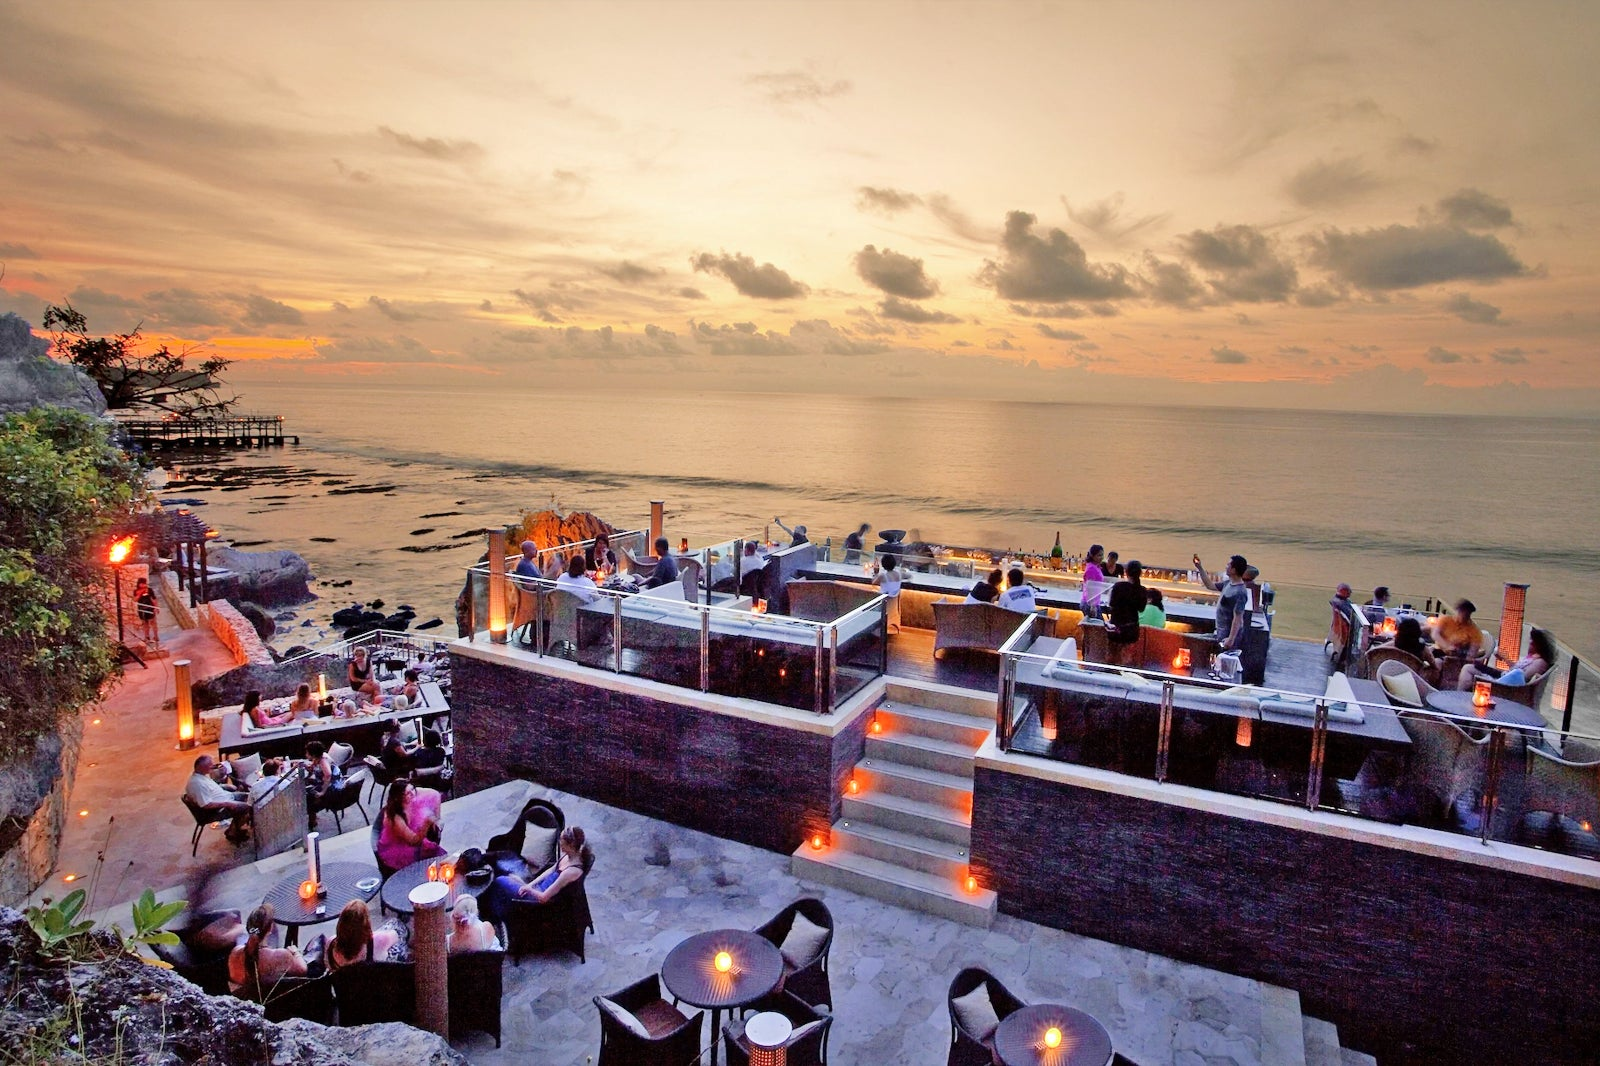 10 Best Romantic Sunset Bars in Bali - Great Bars for ...